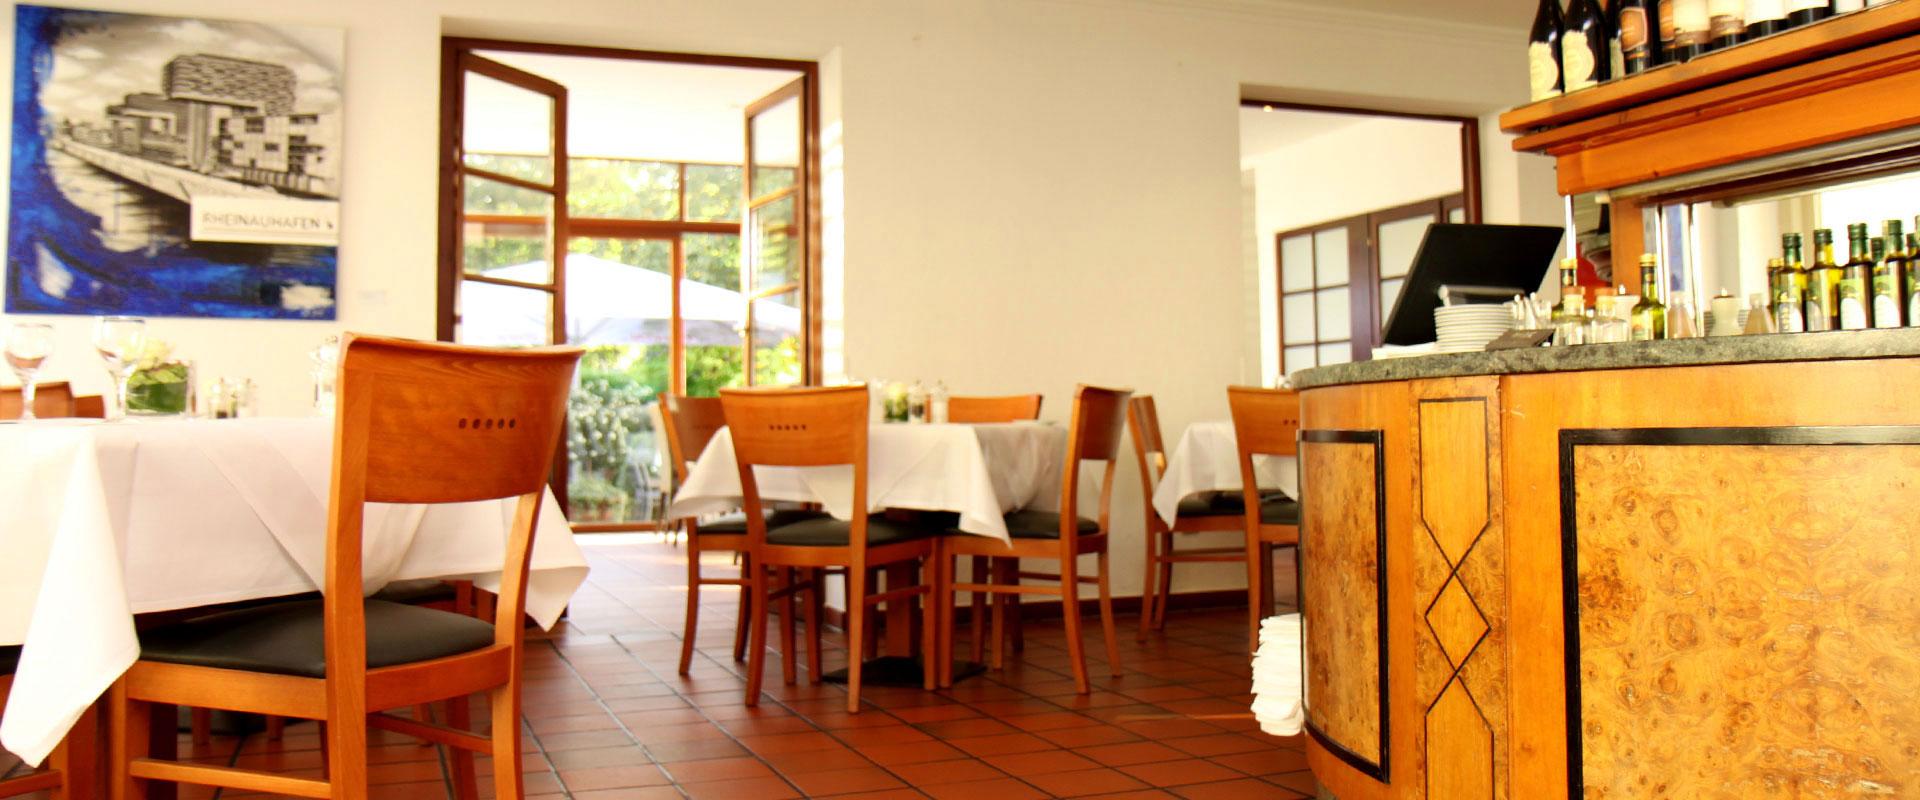 claudio-ristorante-002 ristorante - claudio ristorante 002 - Home